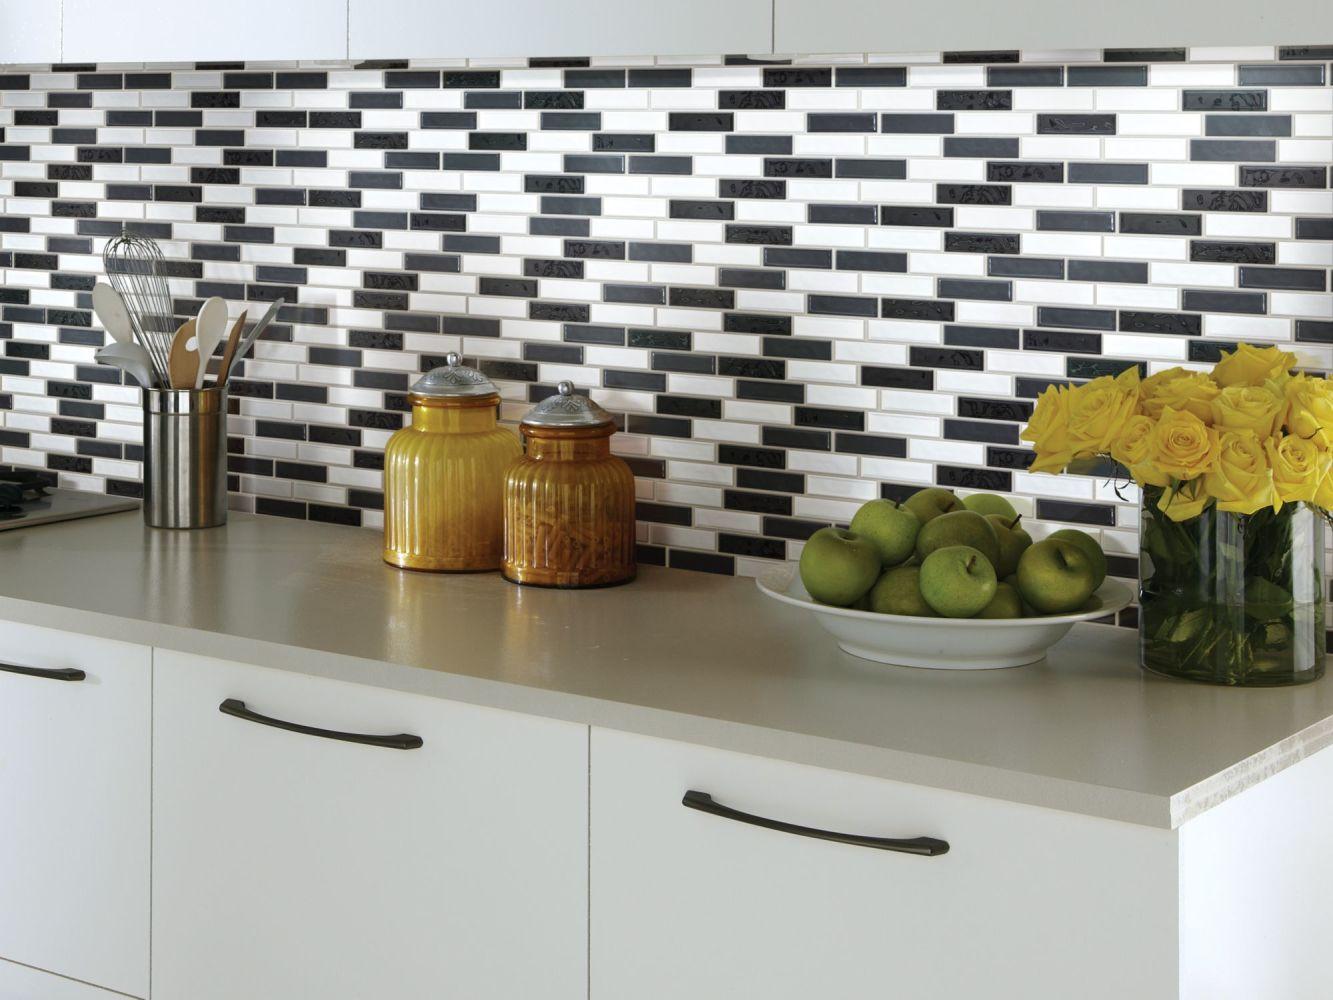 Shaw Floors Toll Brothers Ceramics Geoscapes Random Linear Mosaic Black/White Blend 00151_TL45C